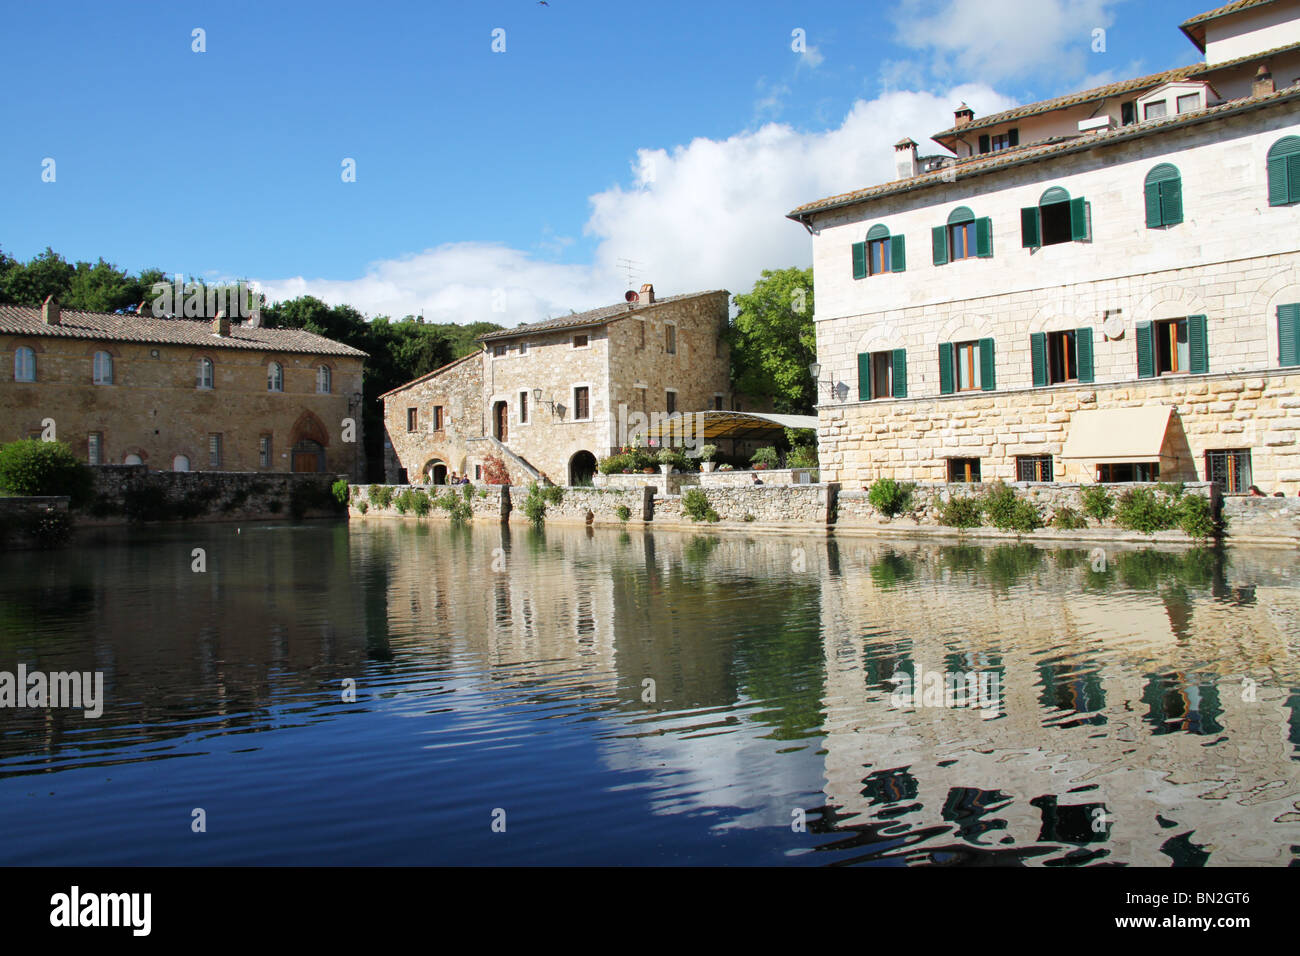 https://c8.alamy.com/comp/BN2GT6/natural-sulphuric-spa-bagno-vignoni-tuscany-italy-BN2GT6.jpg